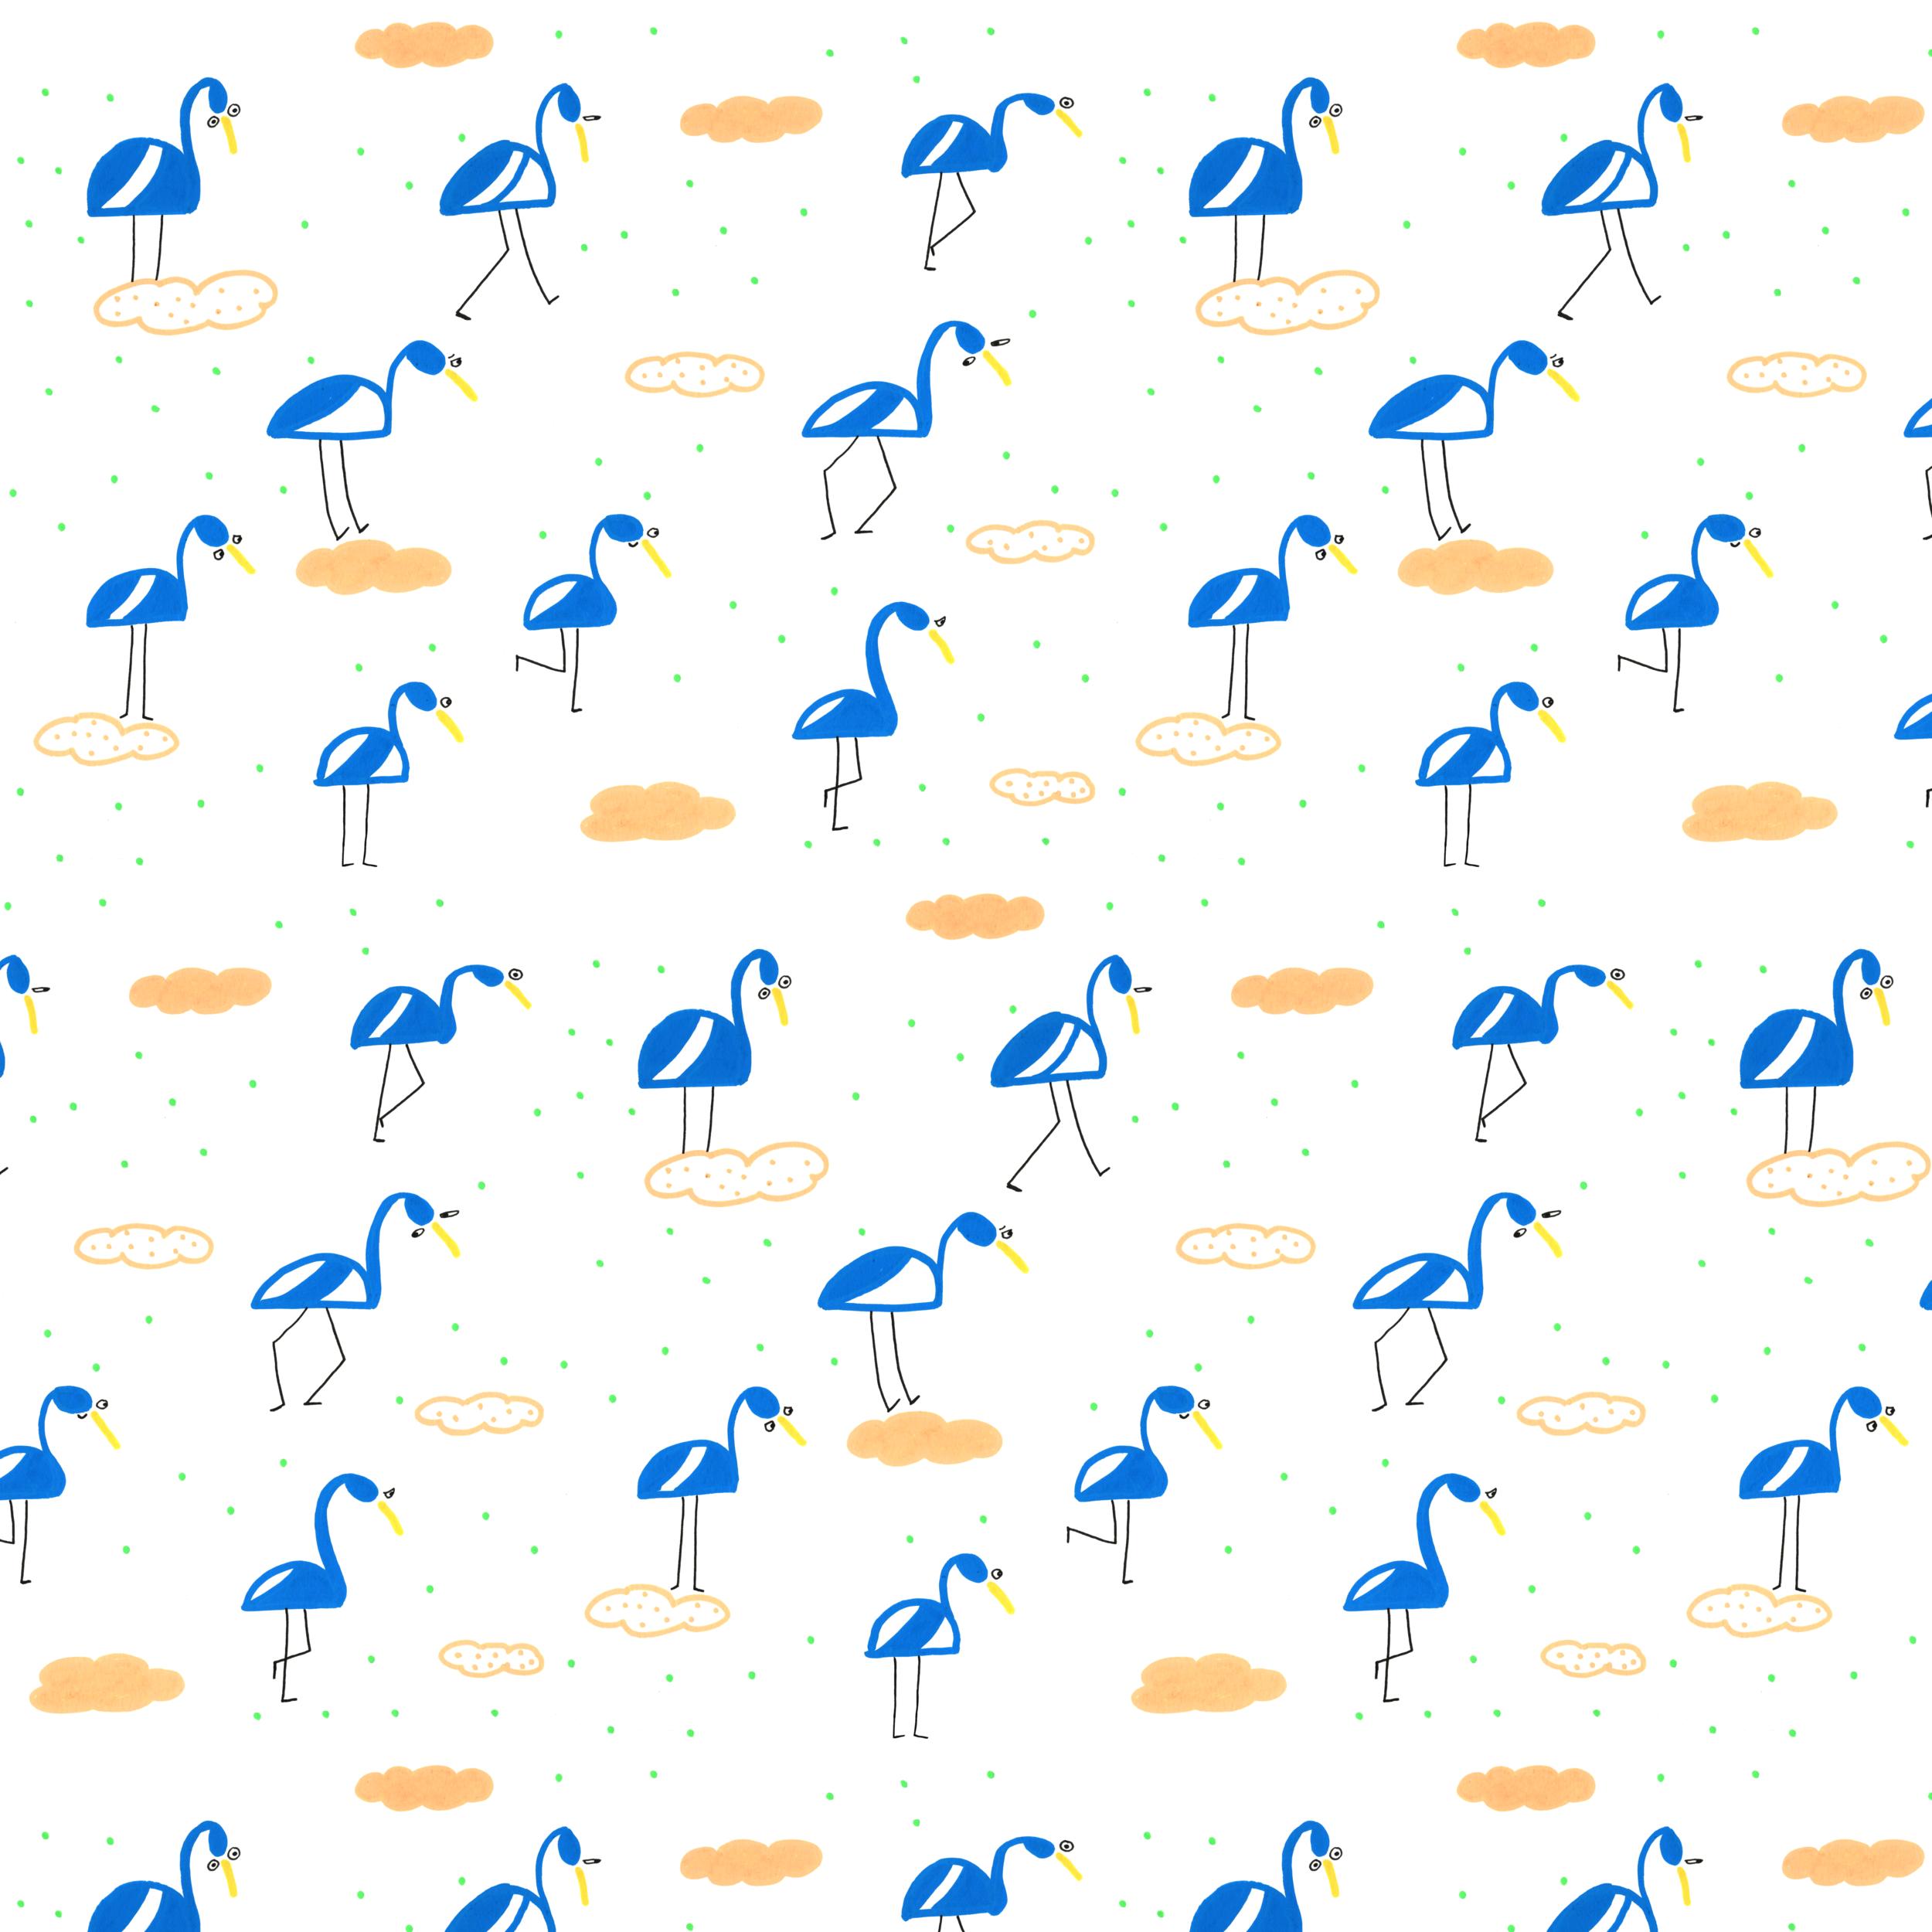 65x65 blue flamingos.png